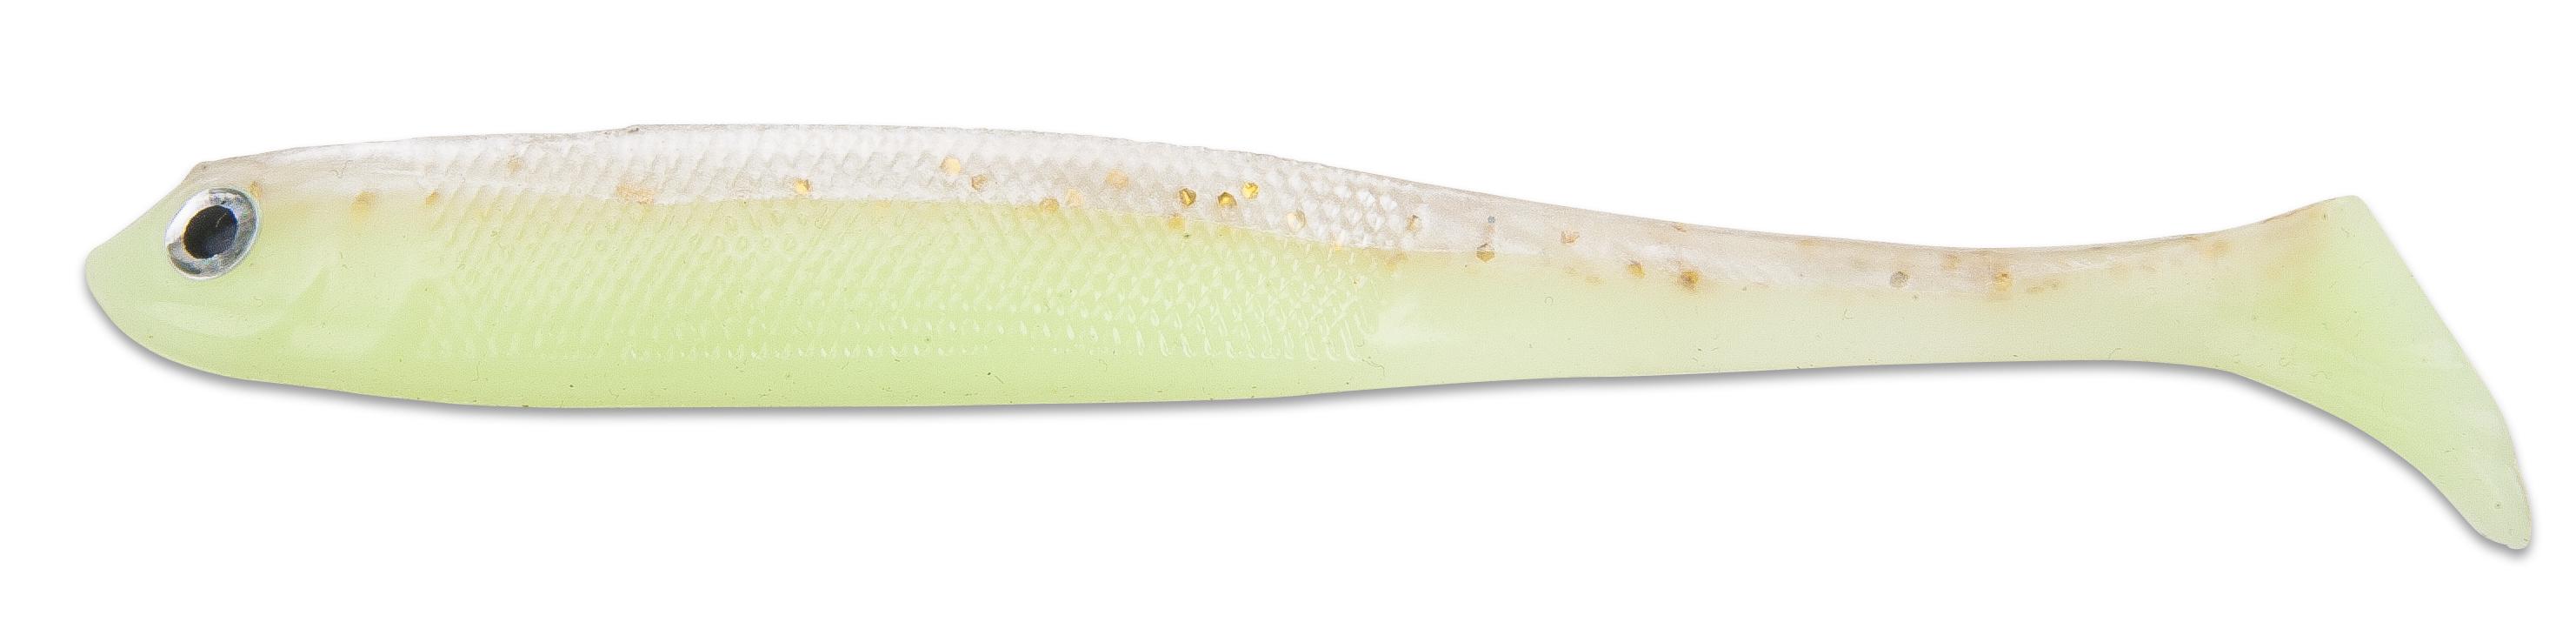 Iron Claw gumová nástraha Slim Jim 13 cm Vzor LU, 3 ks